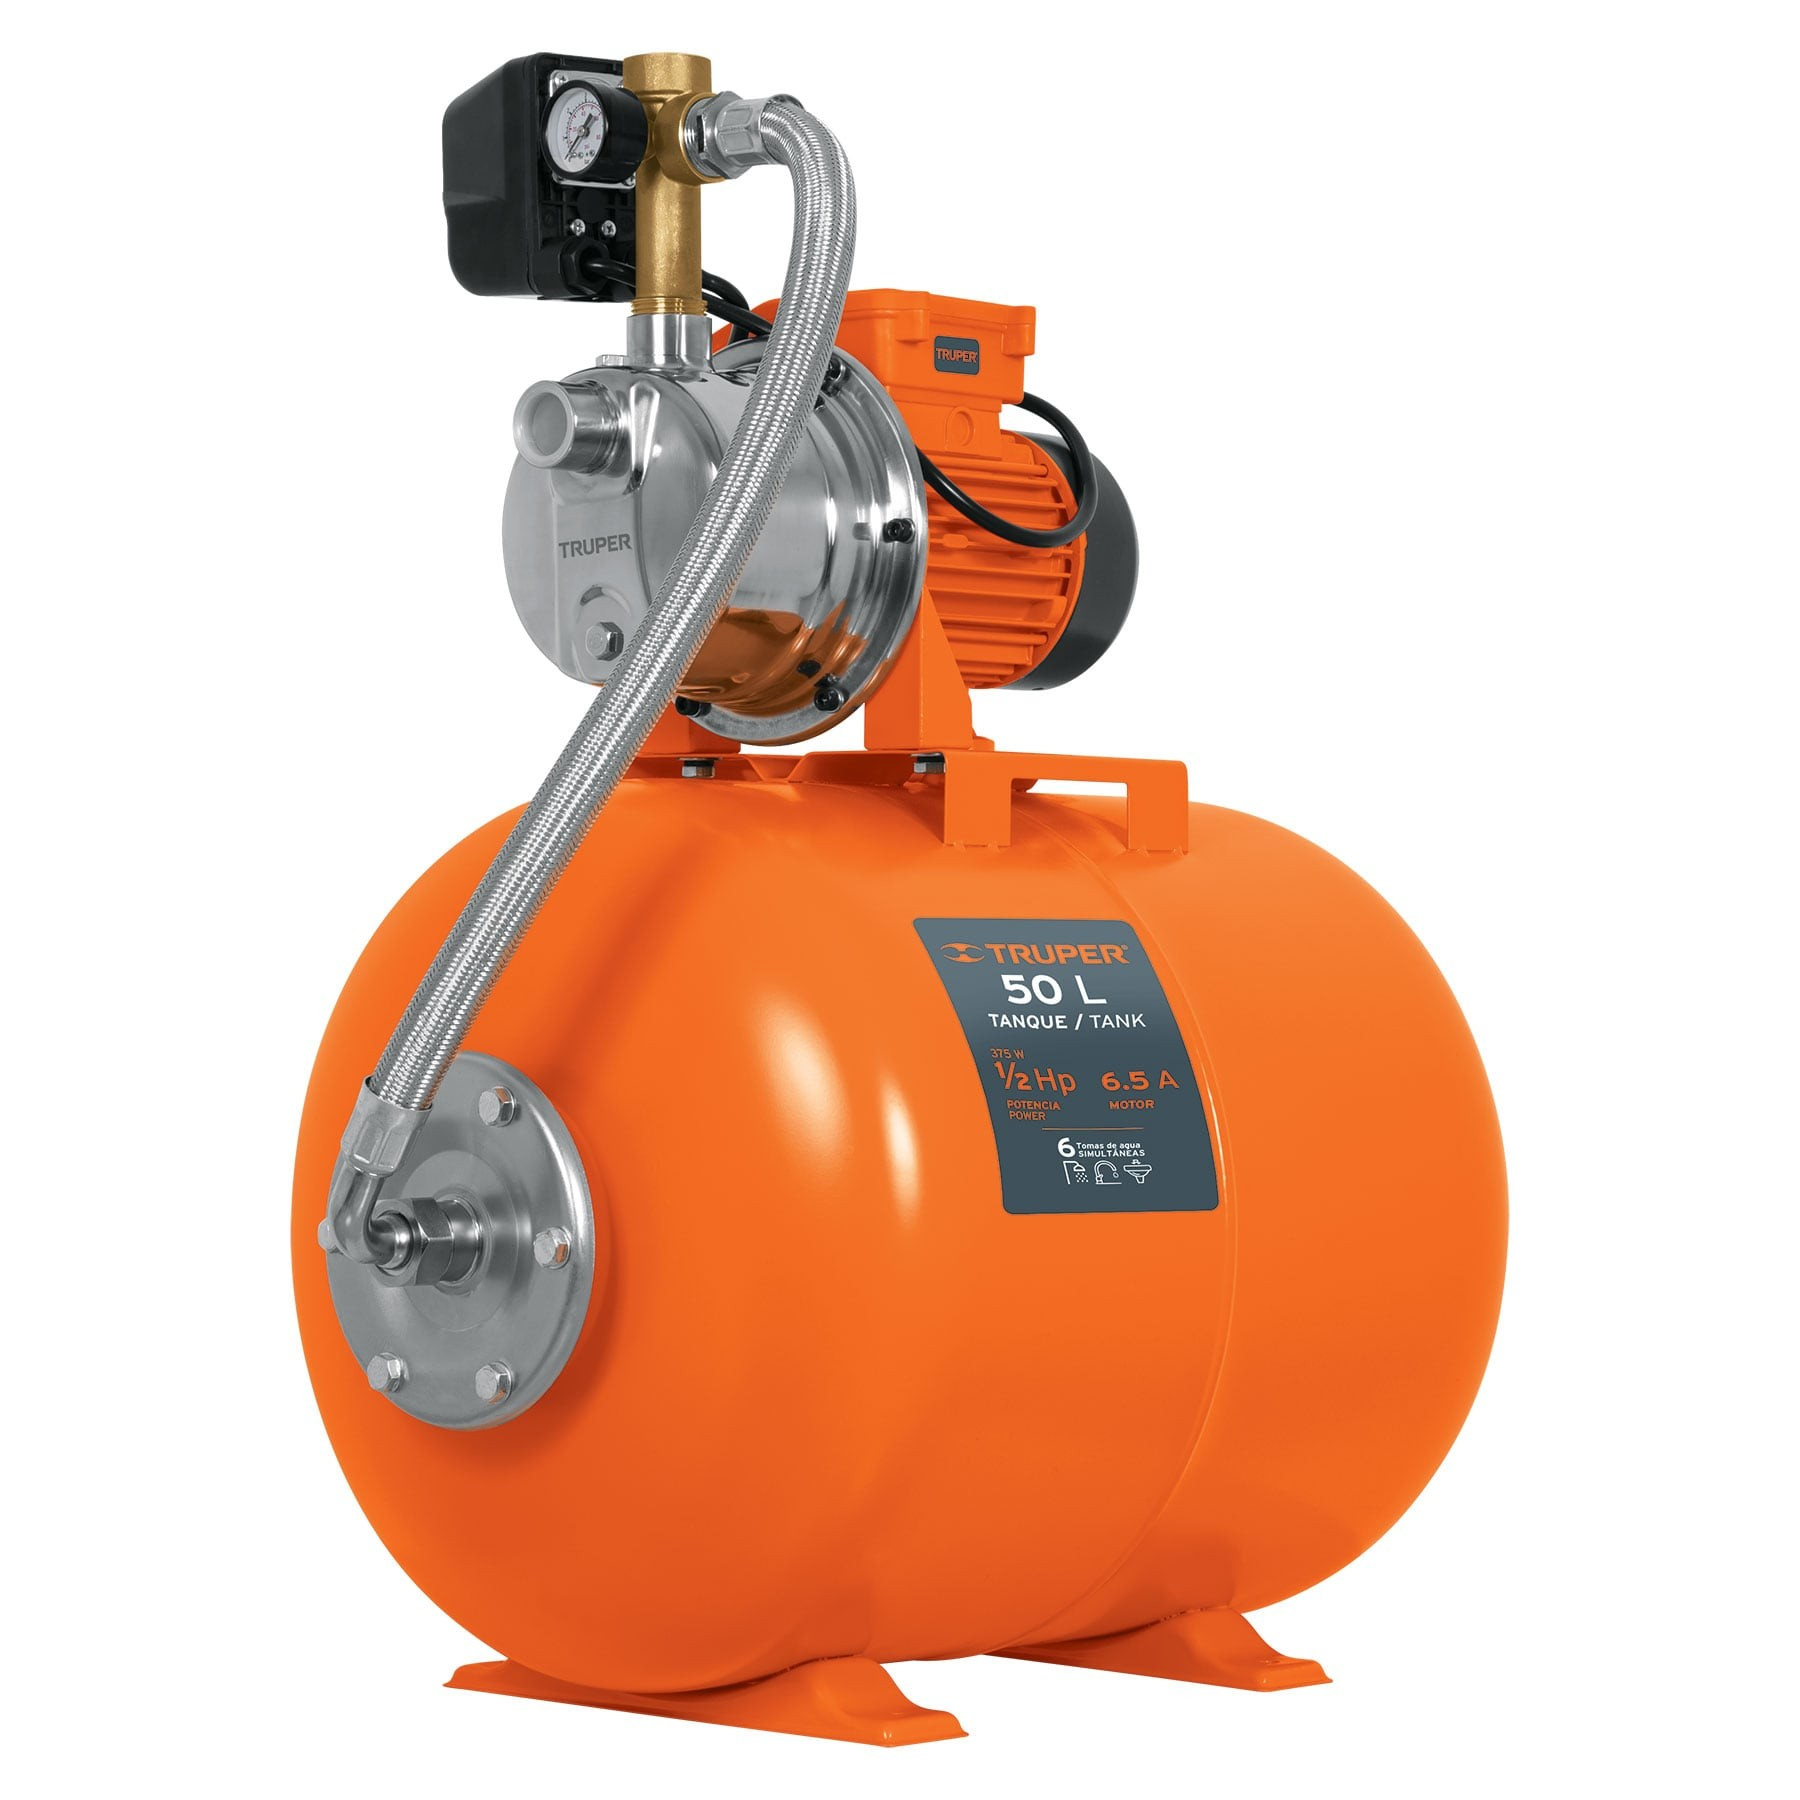 Bomba hidroneumática 1/2 HP, 50 litros